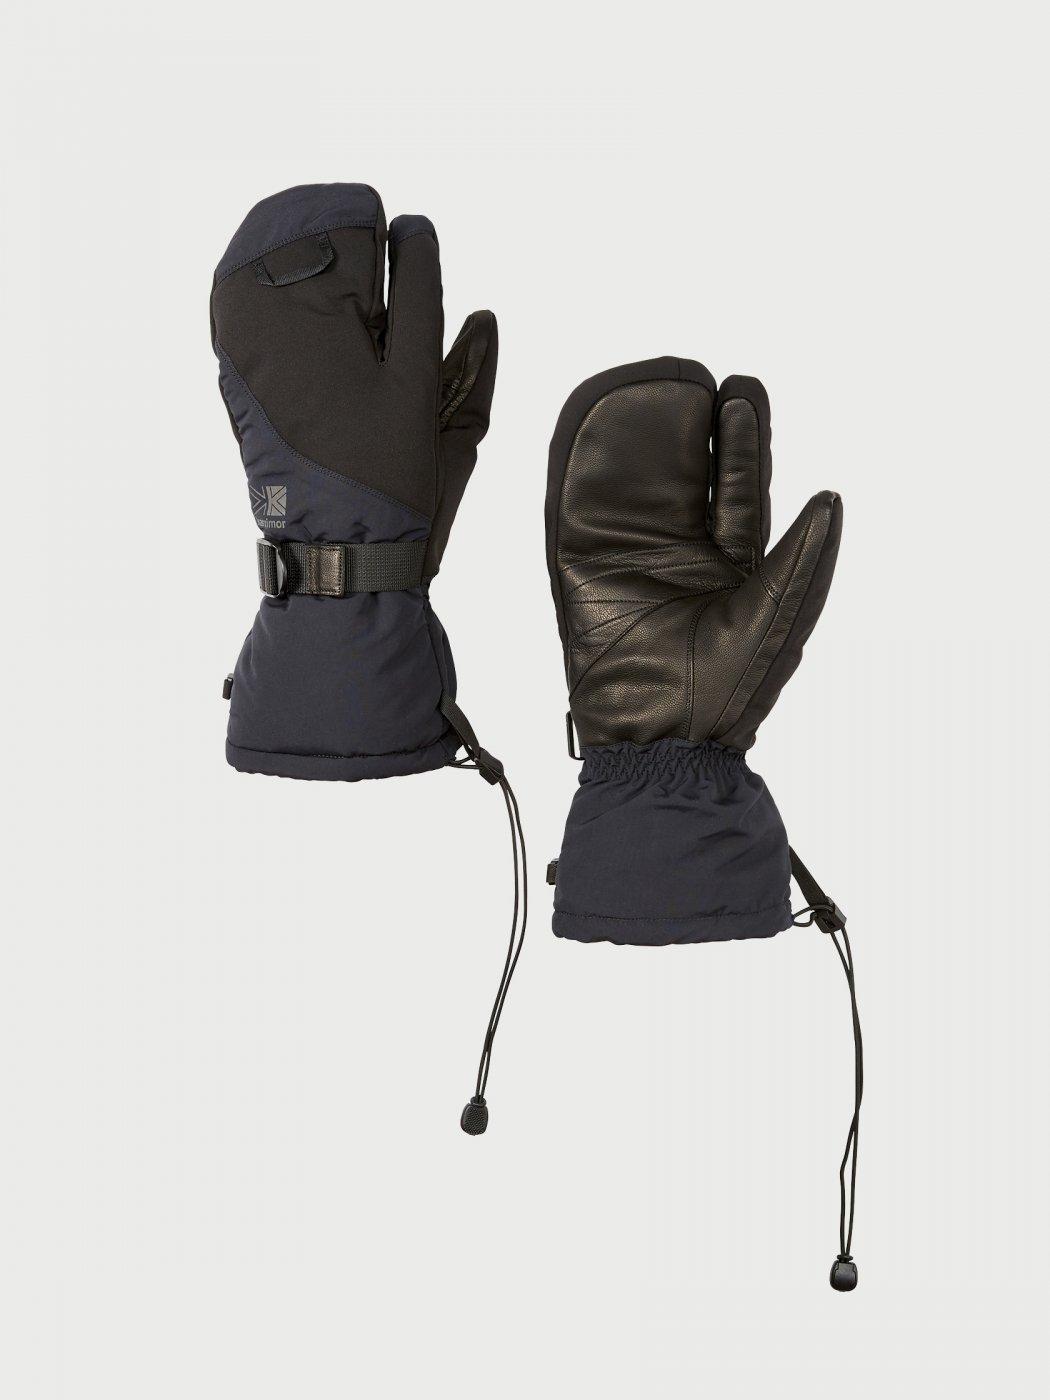 Karrimor-カリマー-separate mitten-BLACK-L